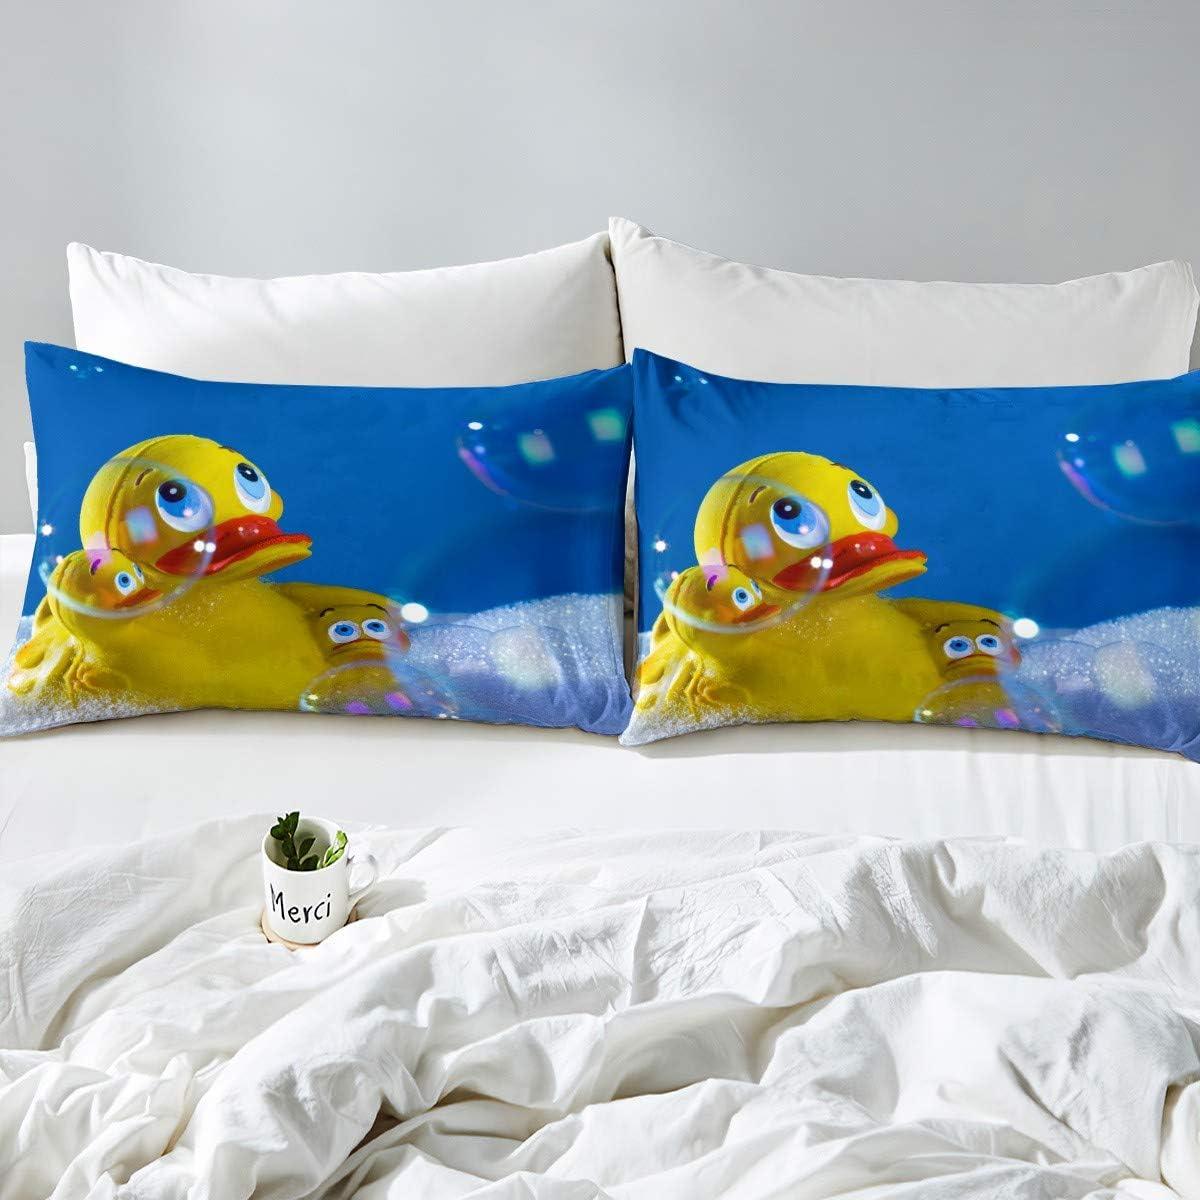 Moon /& Stars Boys Girls 100/% Cotton 3 Pcs Twin Bed Sheet Set Flat Sheet /& Fitted Sheet /& Pillowcase Kids Bedding Set Stars, Twin